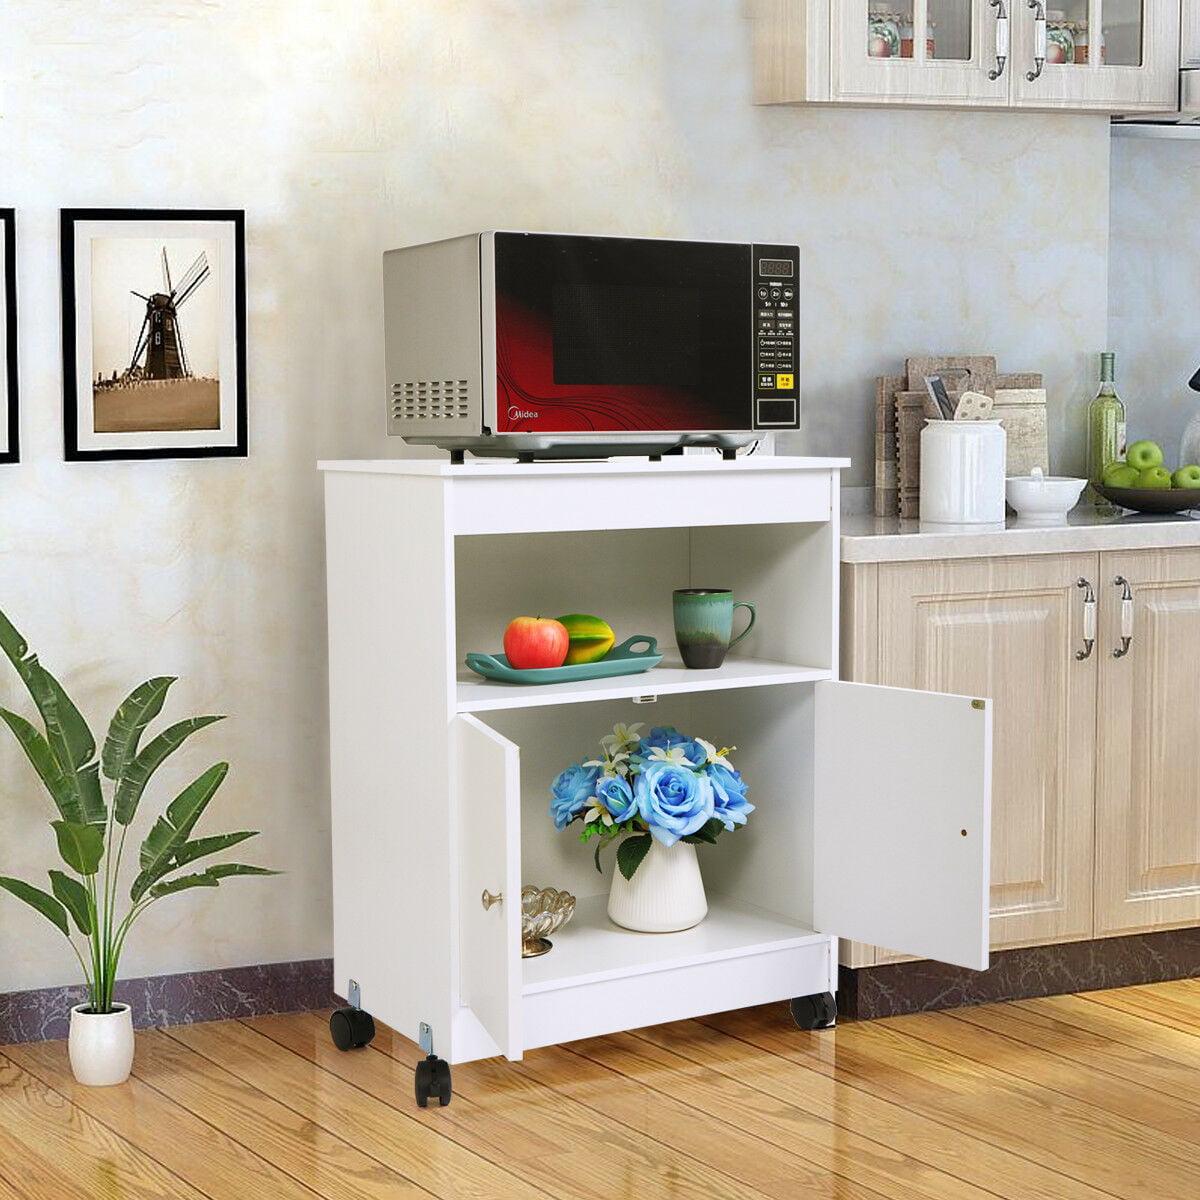 Veryke Kitchen Cabinet, Wooden Kitchen Carts and Islands ...